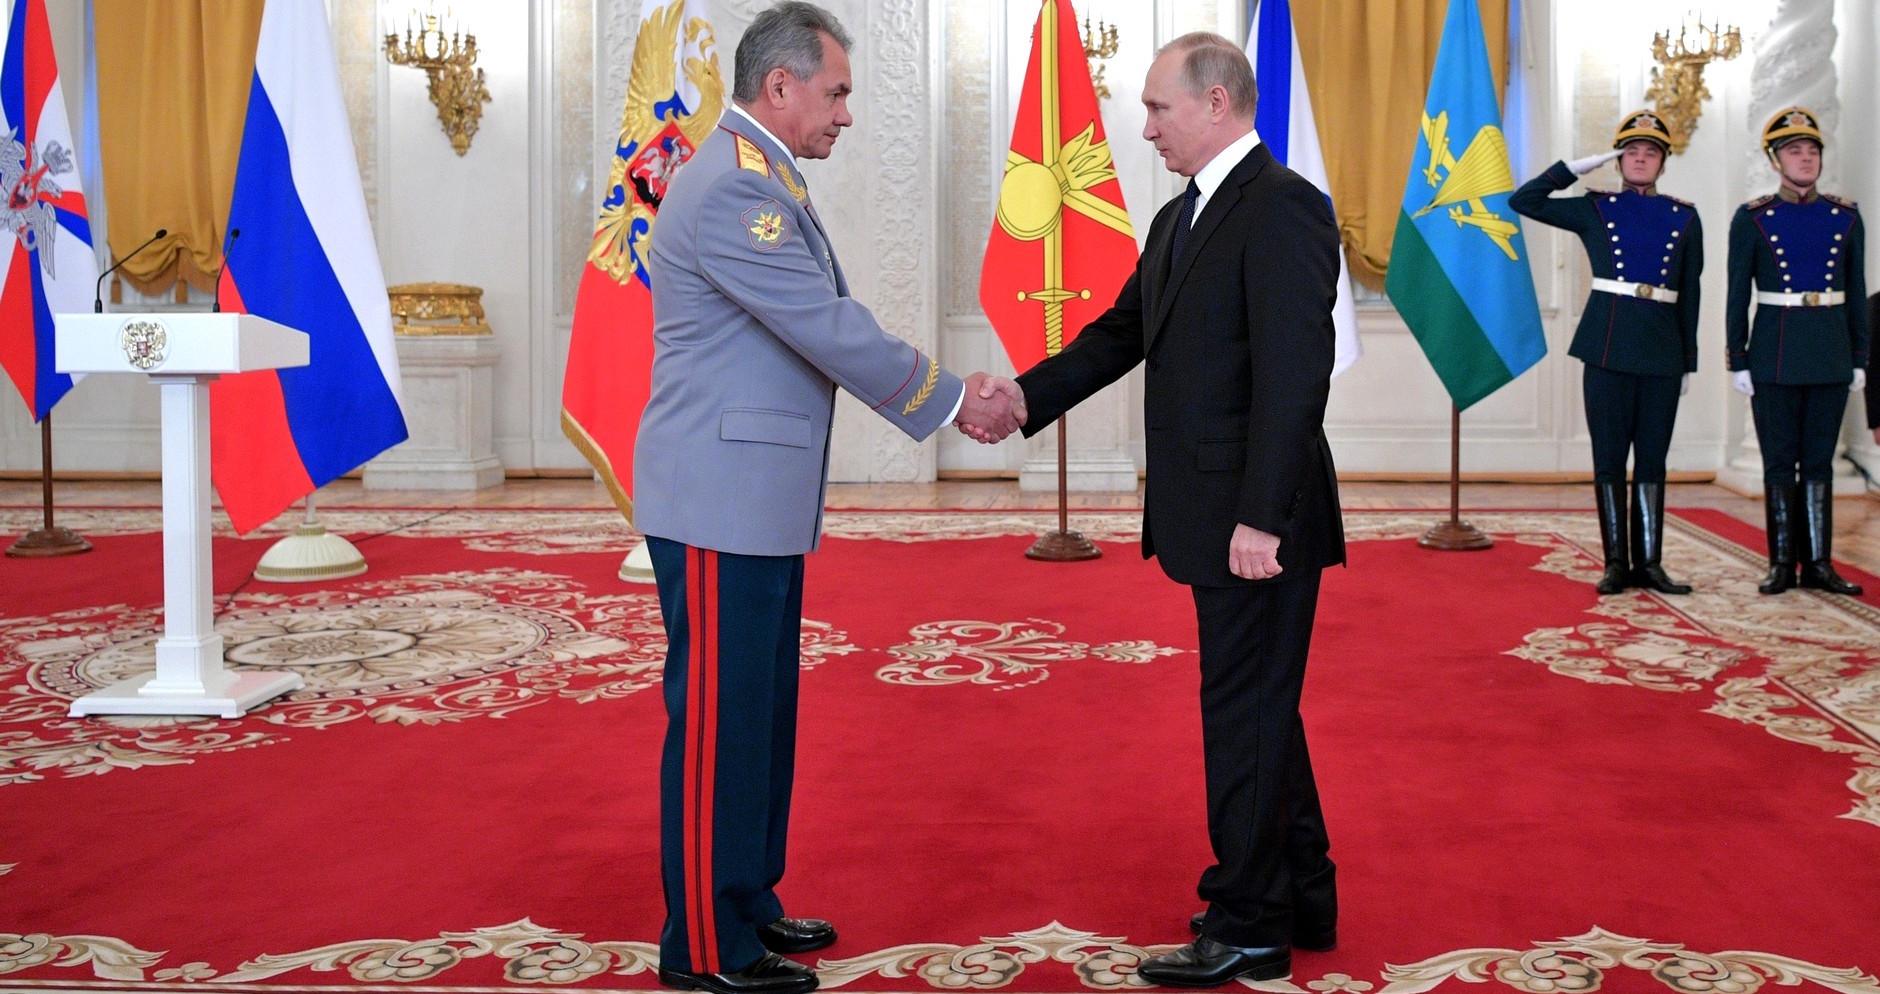 Russian Defence Minister Sergei Shoigu with President Vladimir Putin in December (Photo: Kremlin.ru)